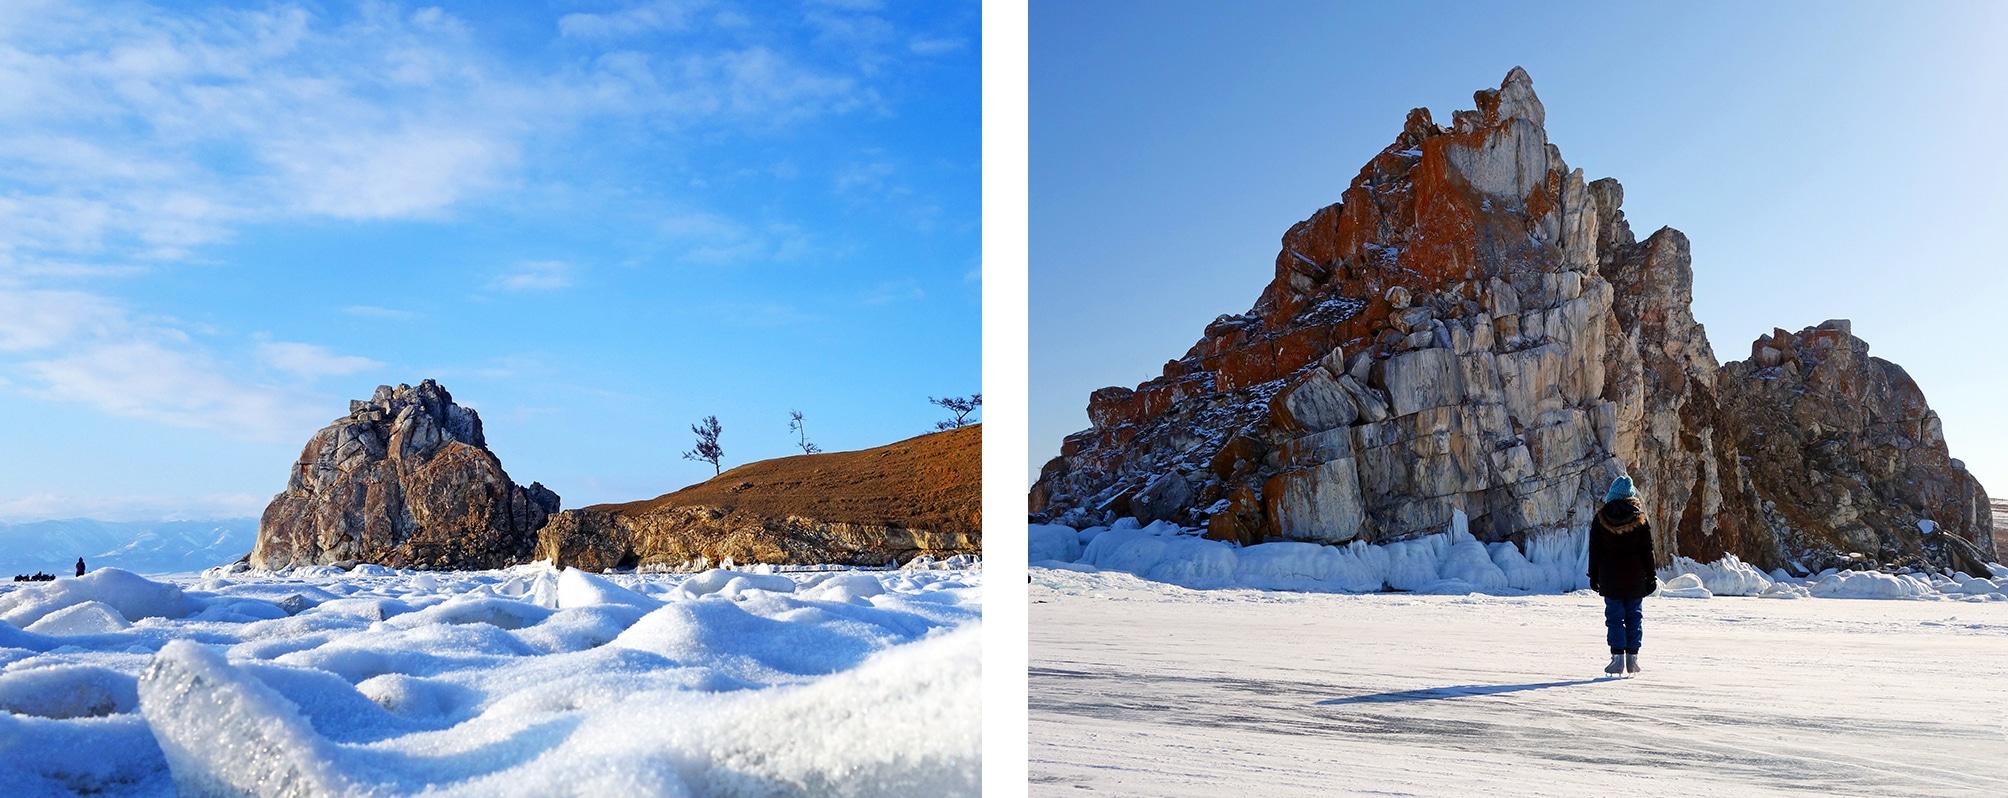 Rocher du chaman lac Baïkal gelé